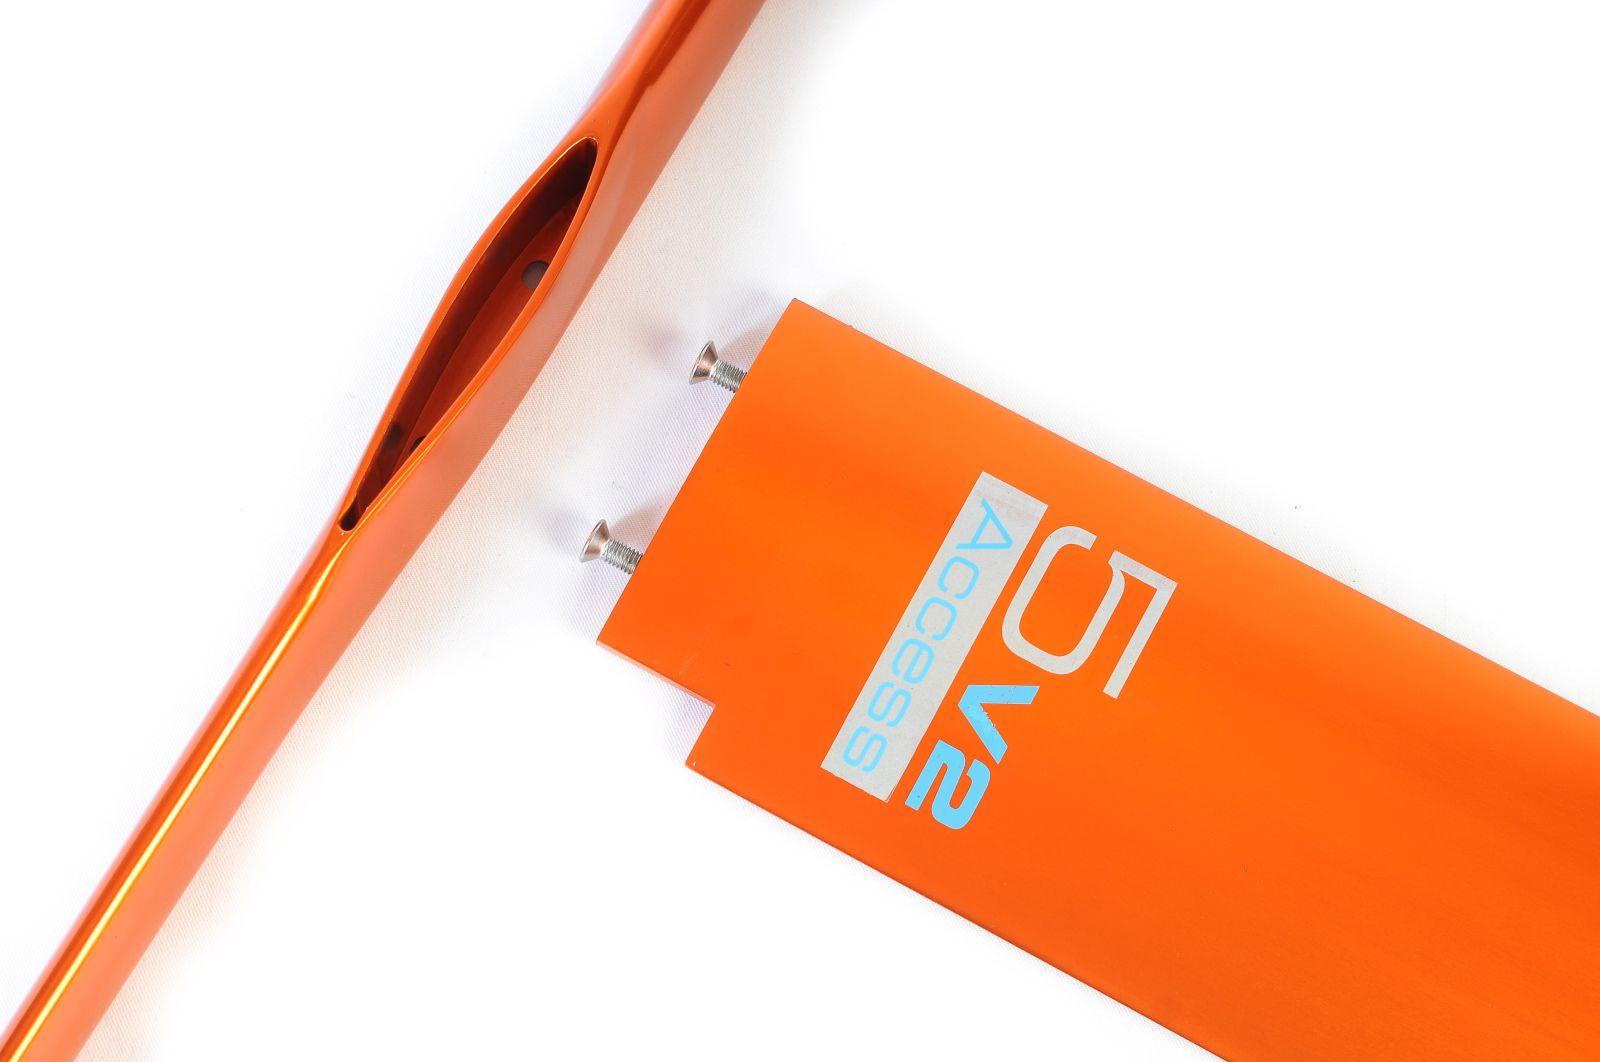 Kitefoil carbon aluminium alpinefoil 5 0 access v2 2374 1